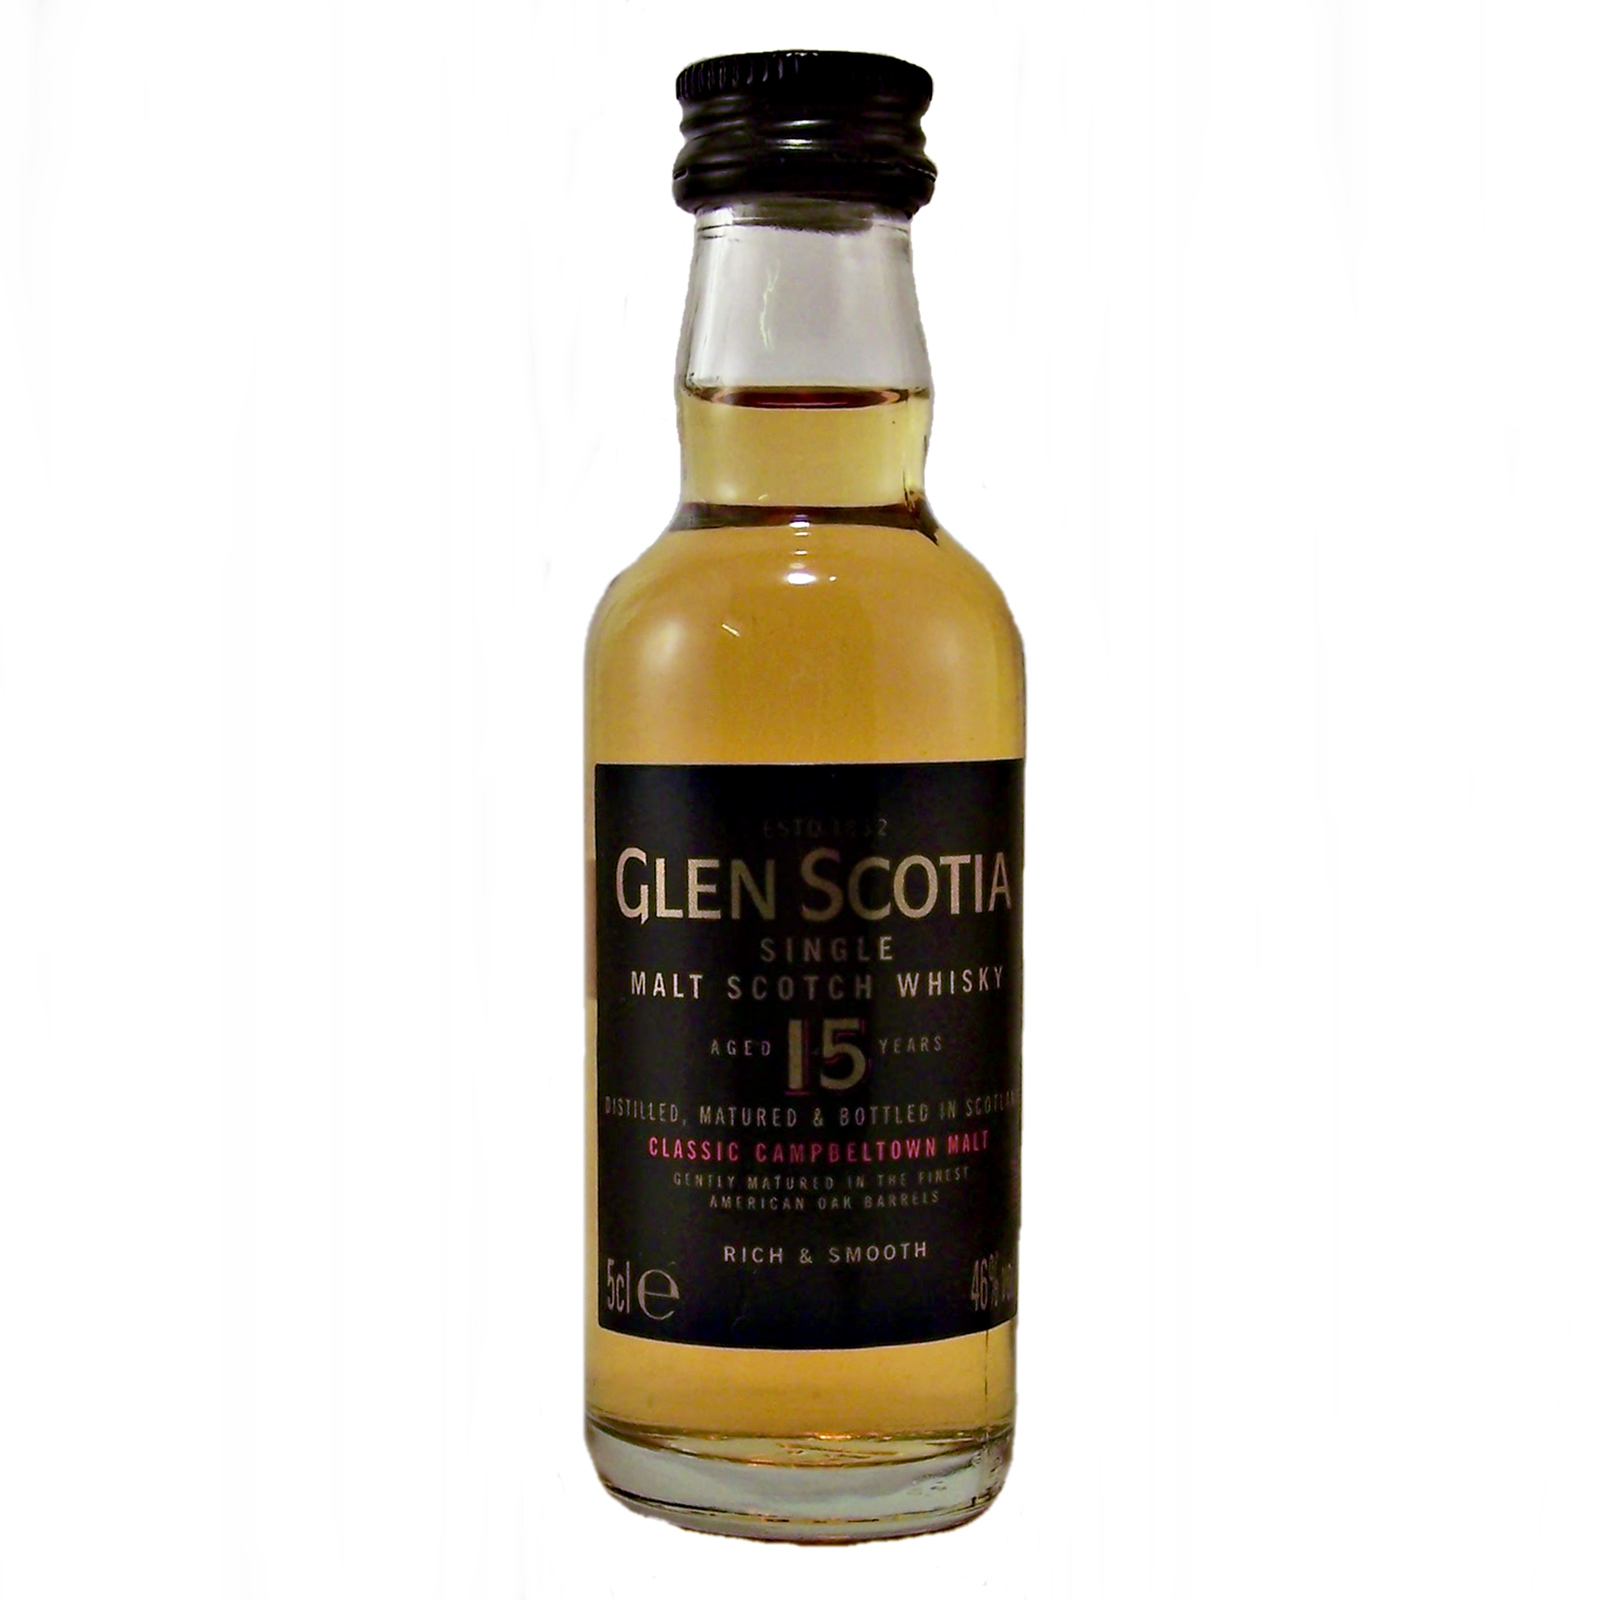 282811ef1a6e Glen Scotia 15 year old Whisky Miniature Single Malt